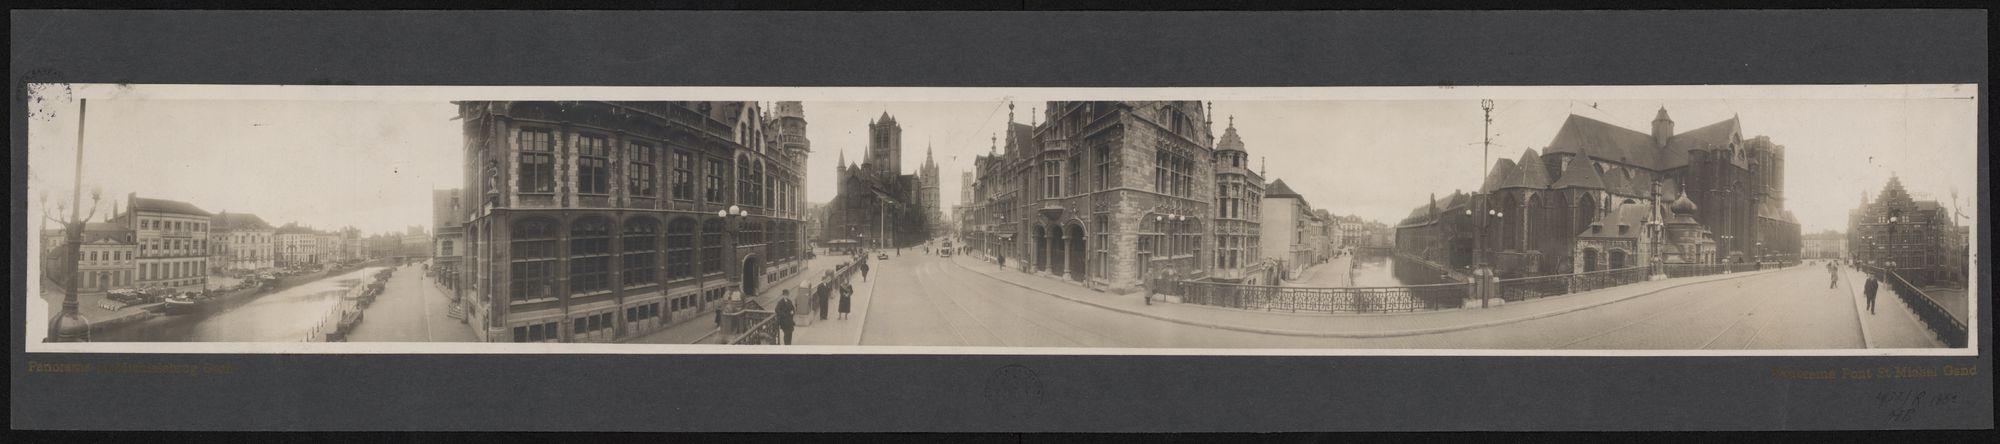 Gent: Panoramafoto Sint-Michielsbrug met: Korenlei en Graslei, Postgebouw, Sint-Michielshelling, Torens van Sint-Niklaaskerk, Belfort en Sint-Baafs, Predikherenlei, Pand, Sint-Michielsbrug en Sint-Michielskek